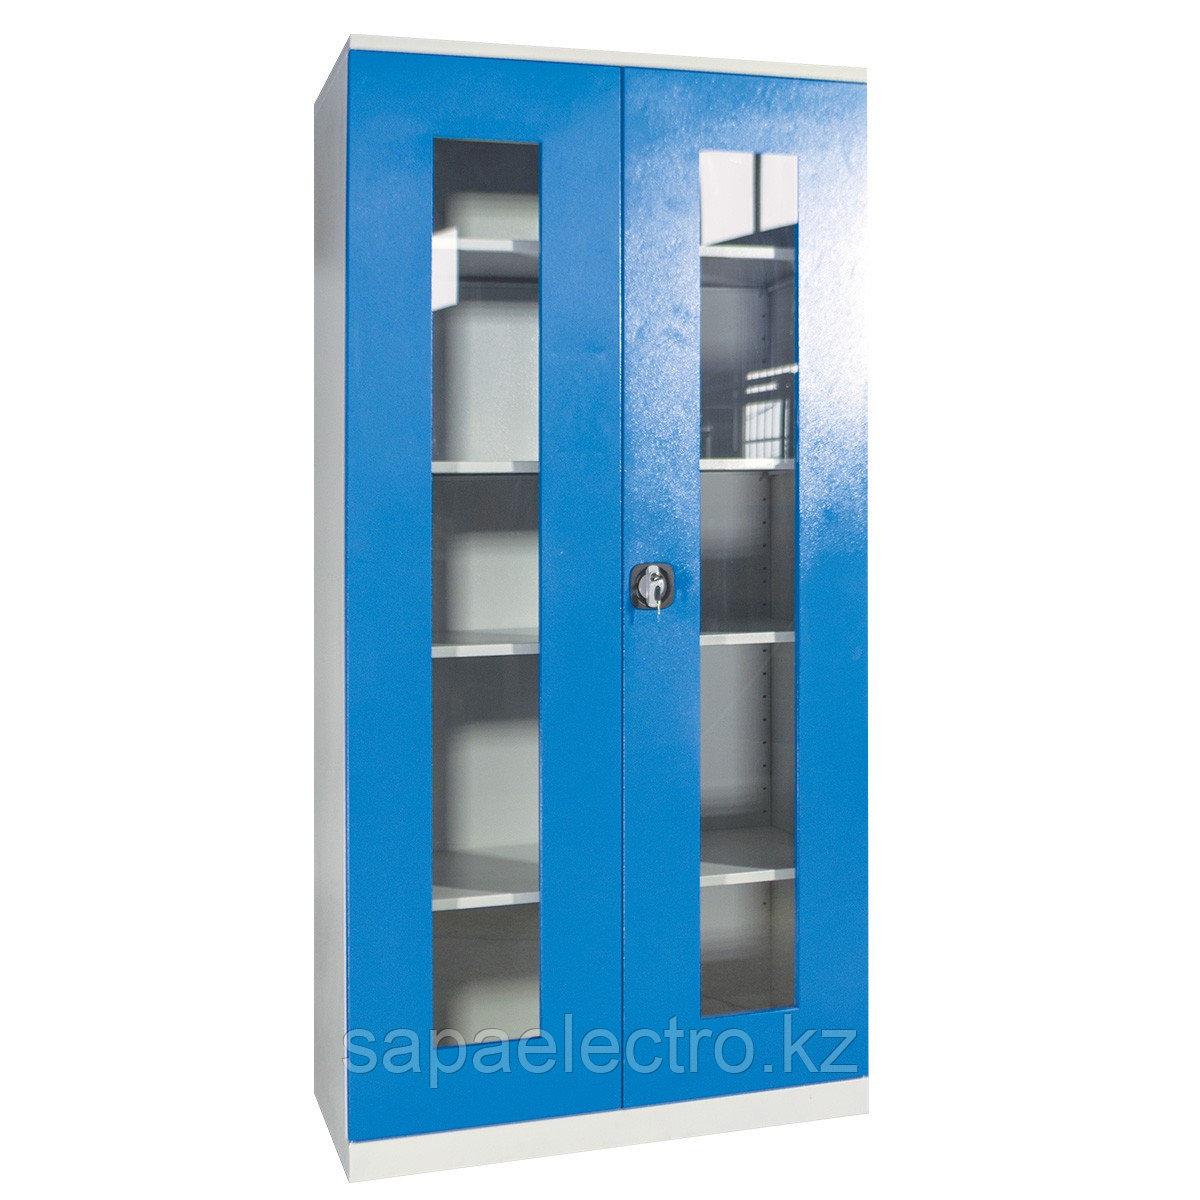 Металл.Шкаф со стеклянными дверцами (серо-синий)(10